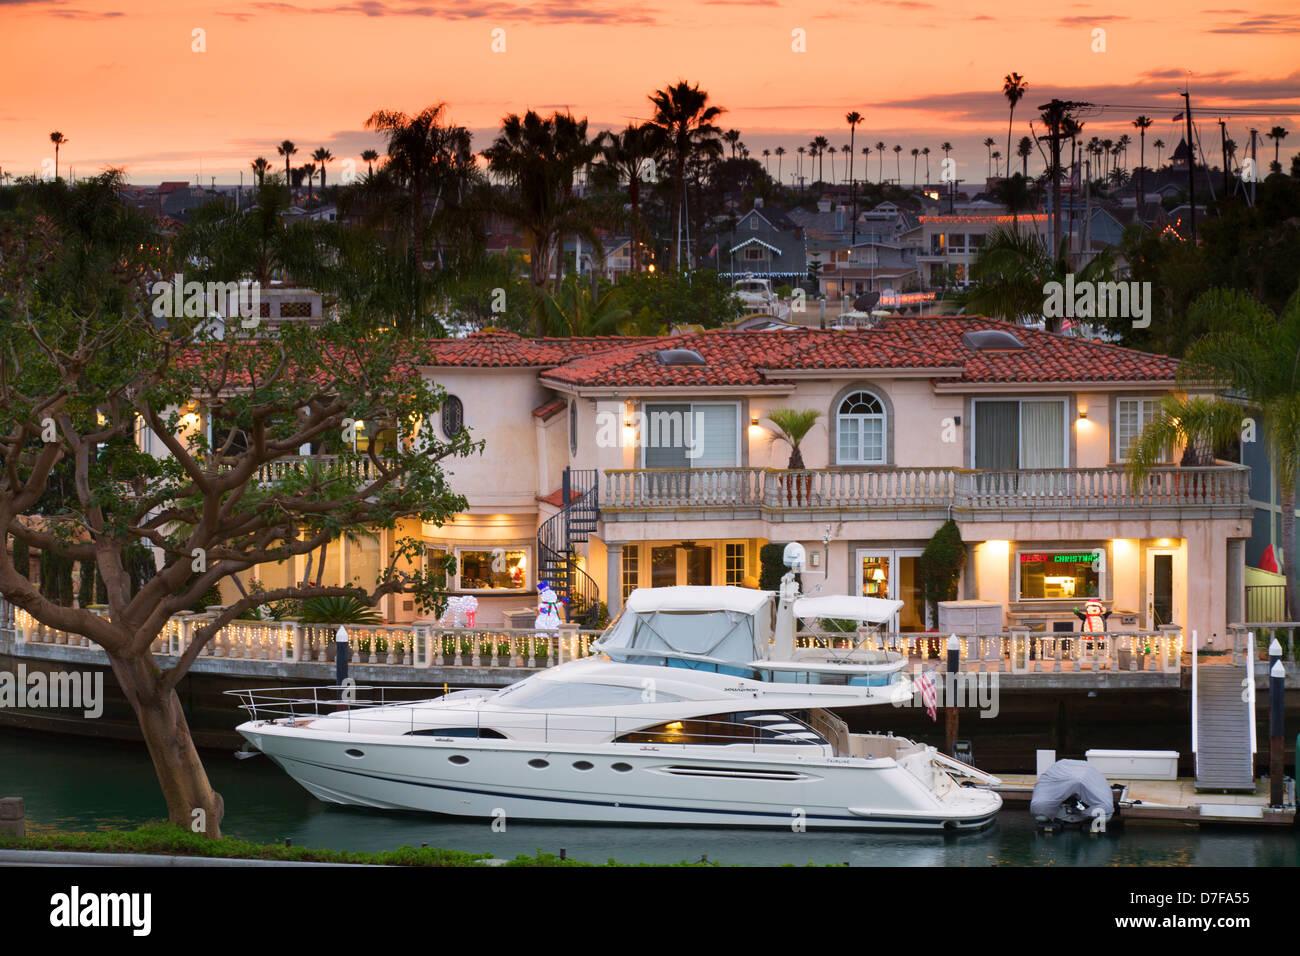 Yachts on harbor island newport beach orange county - Maison d architecte orange county californie ...